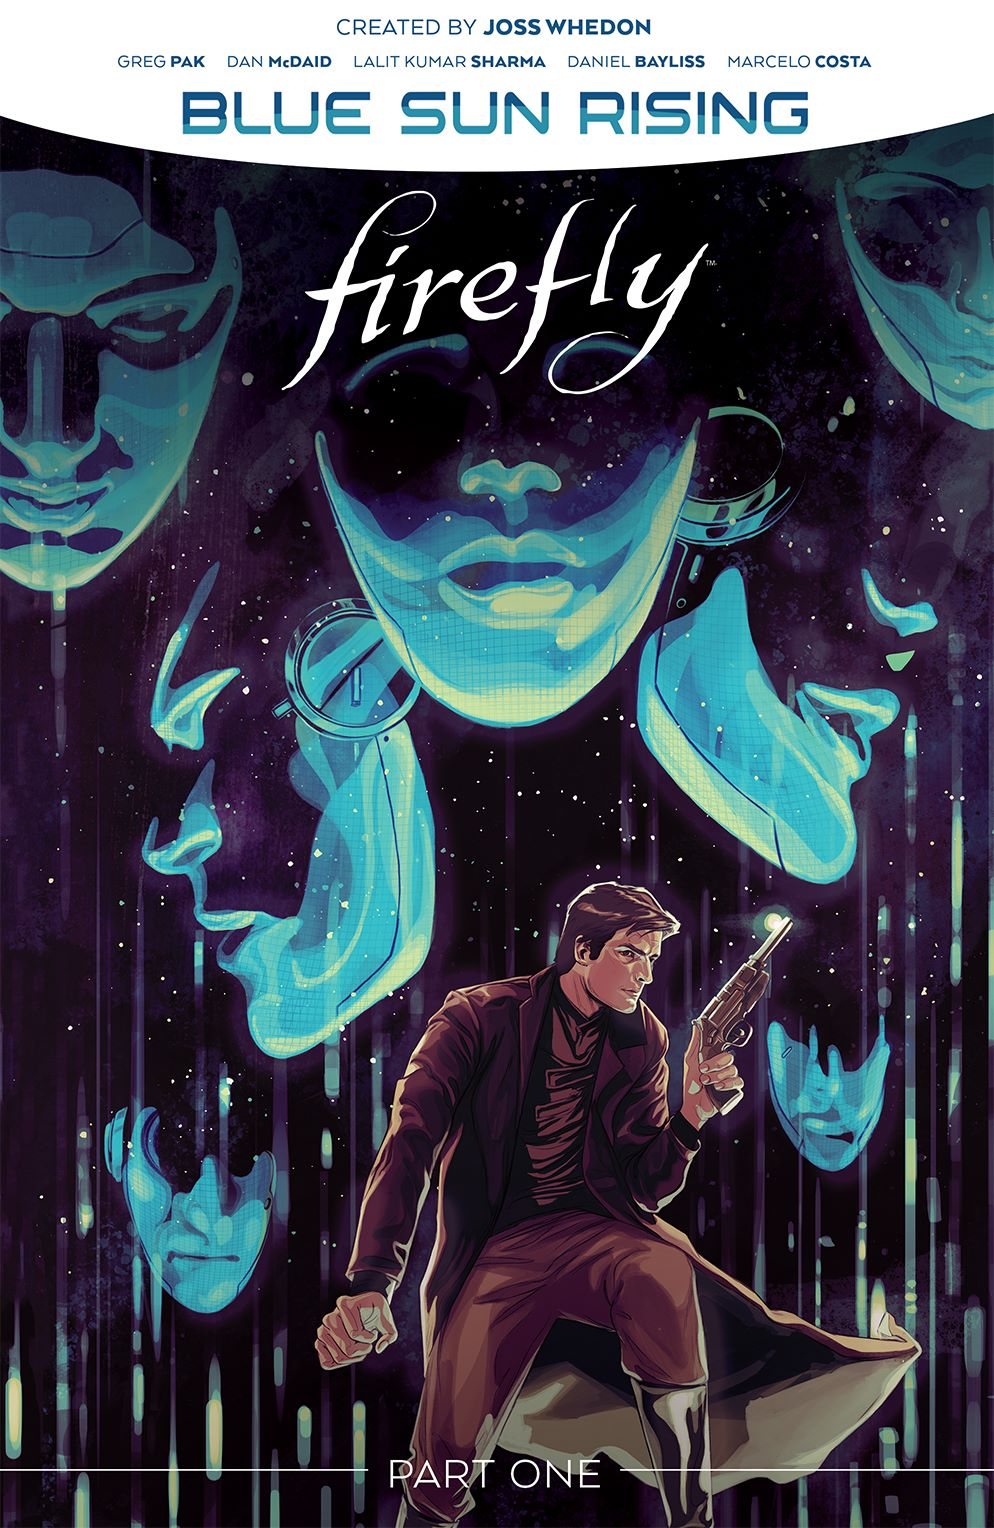 Firefly_BlueSunRising_v1_HC_Cover ComicList: BOOM! Studios New Releases for 03/31/2021